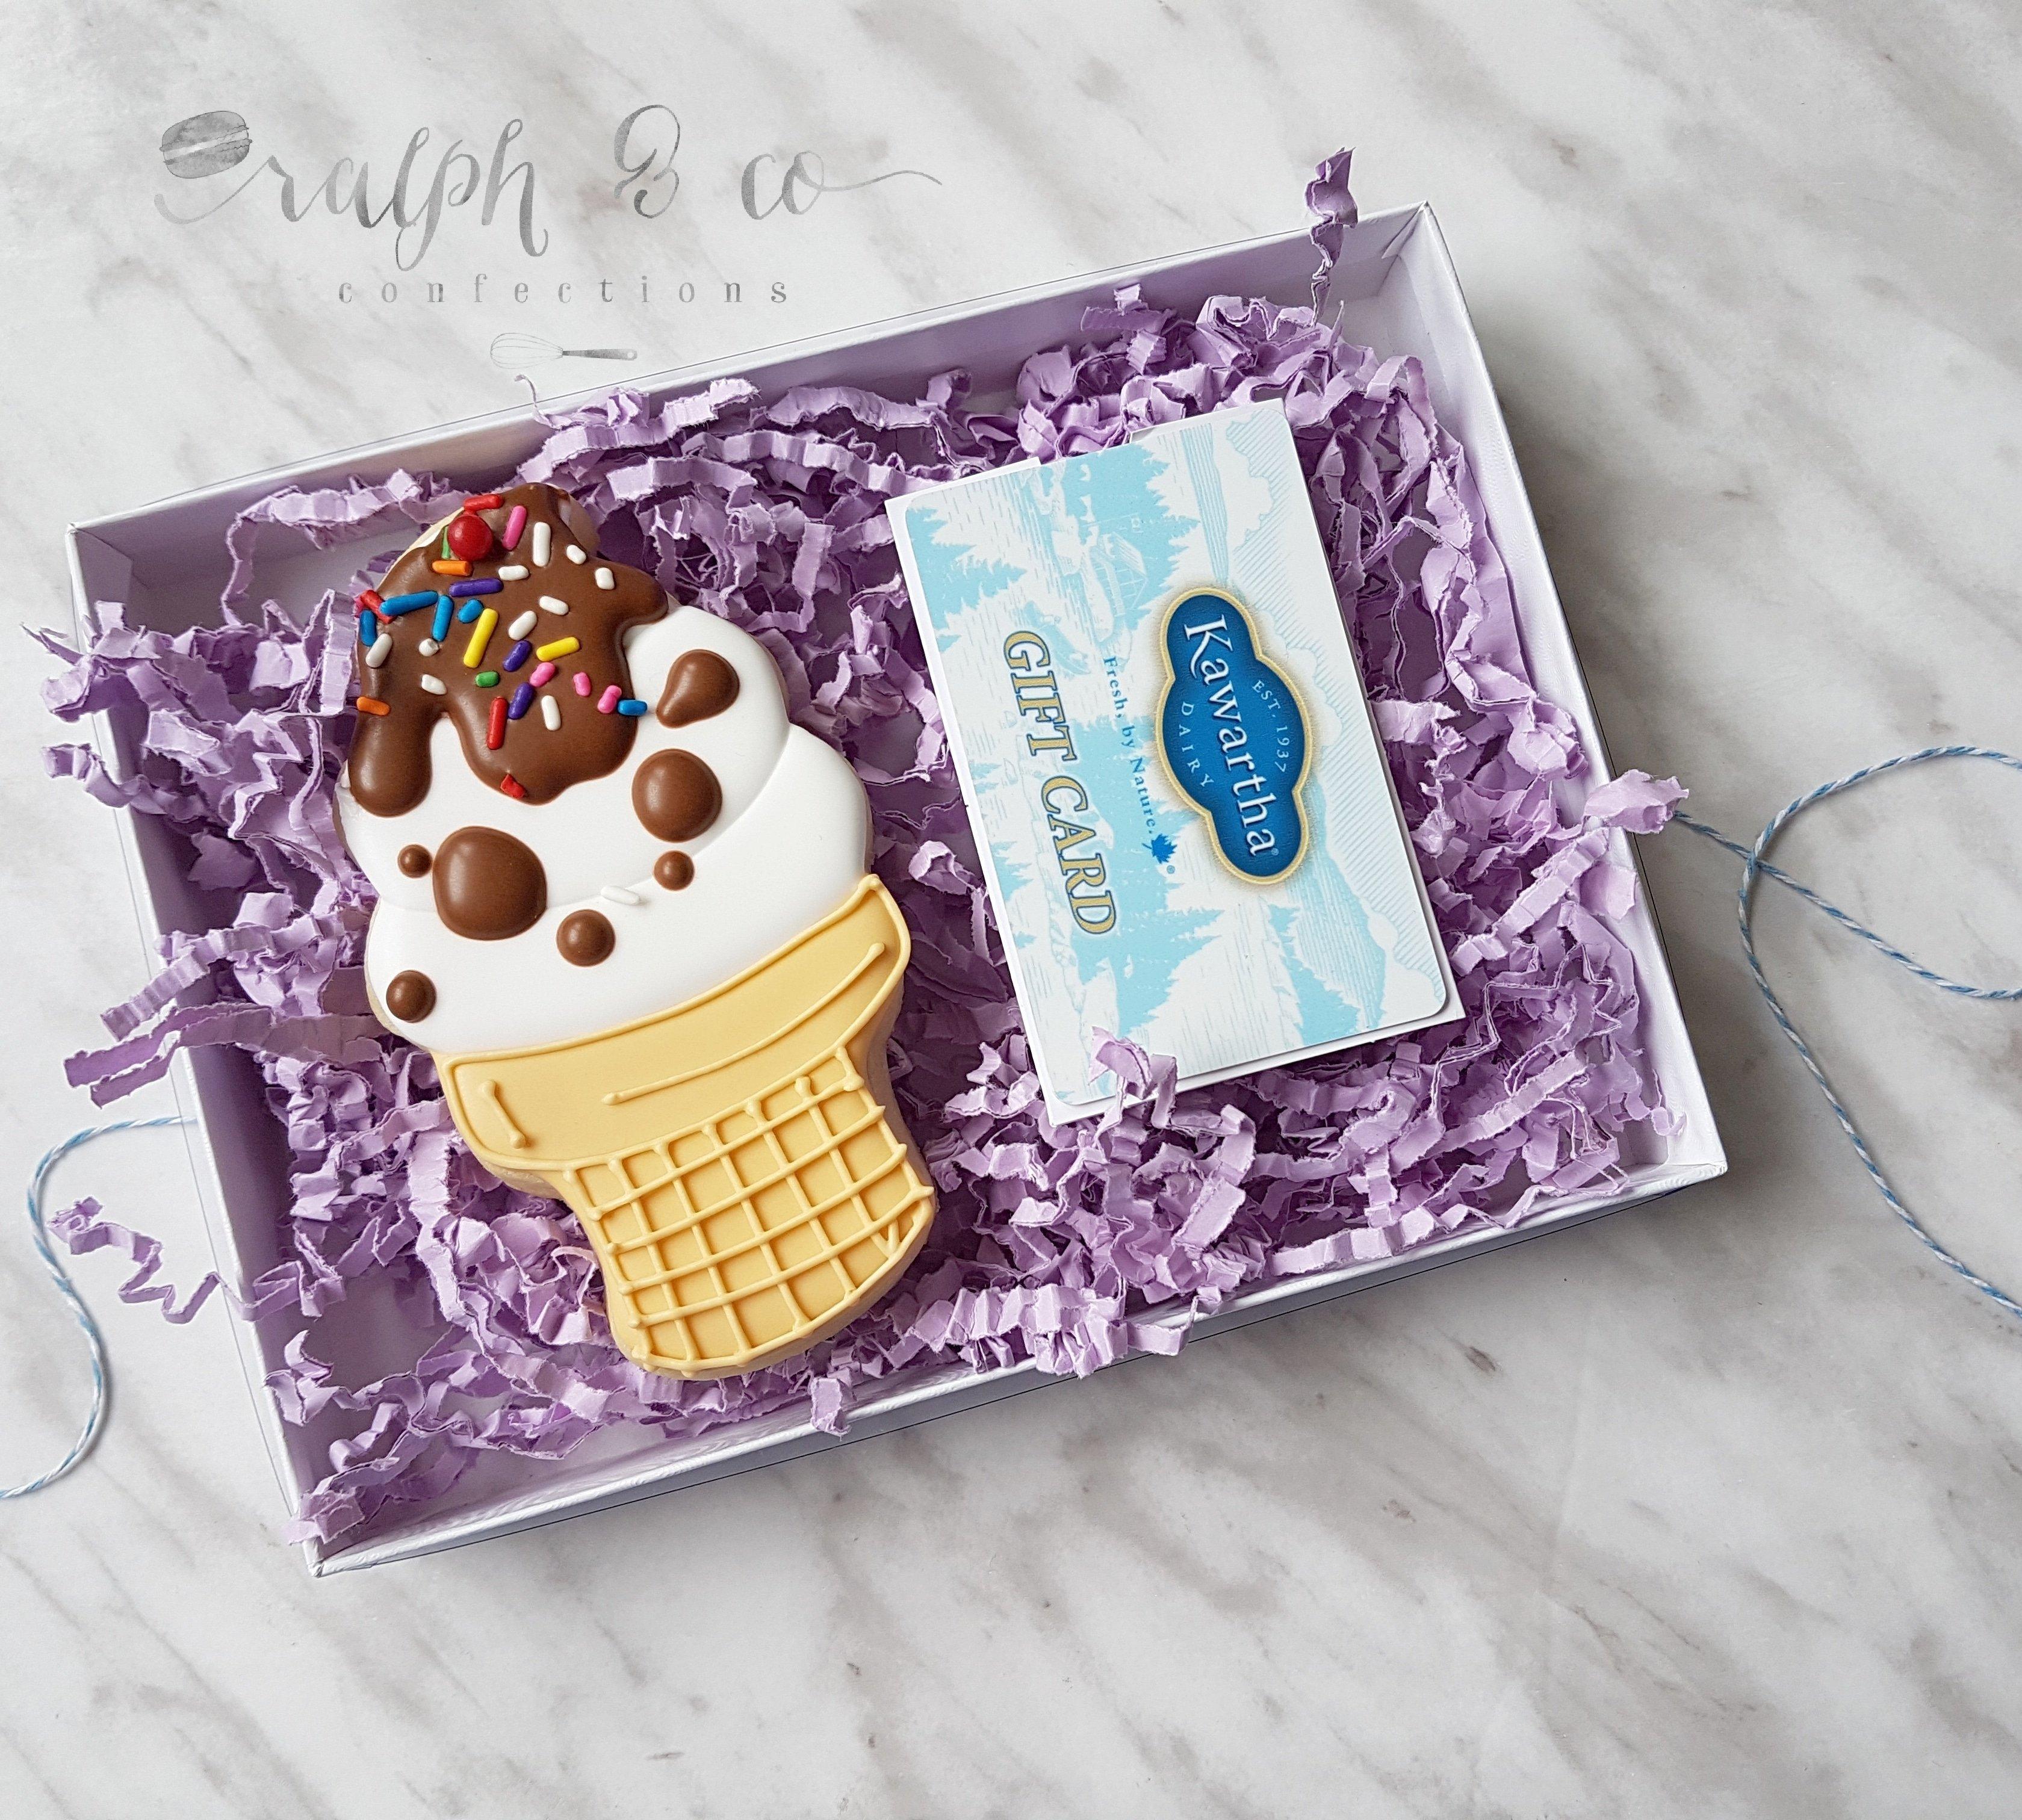 Ice Cream Cone & Kawartha Dairy Gift Card 00002